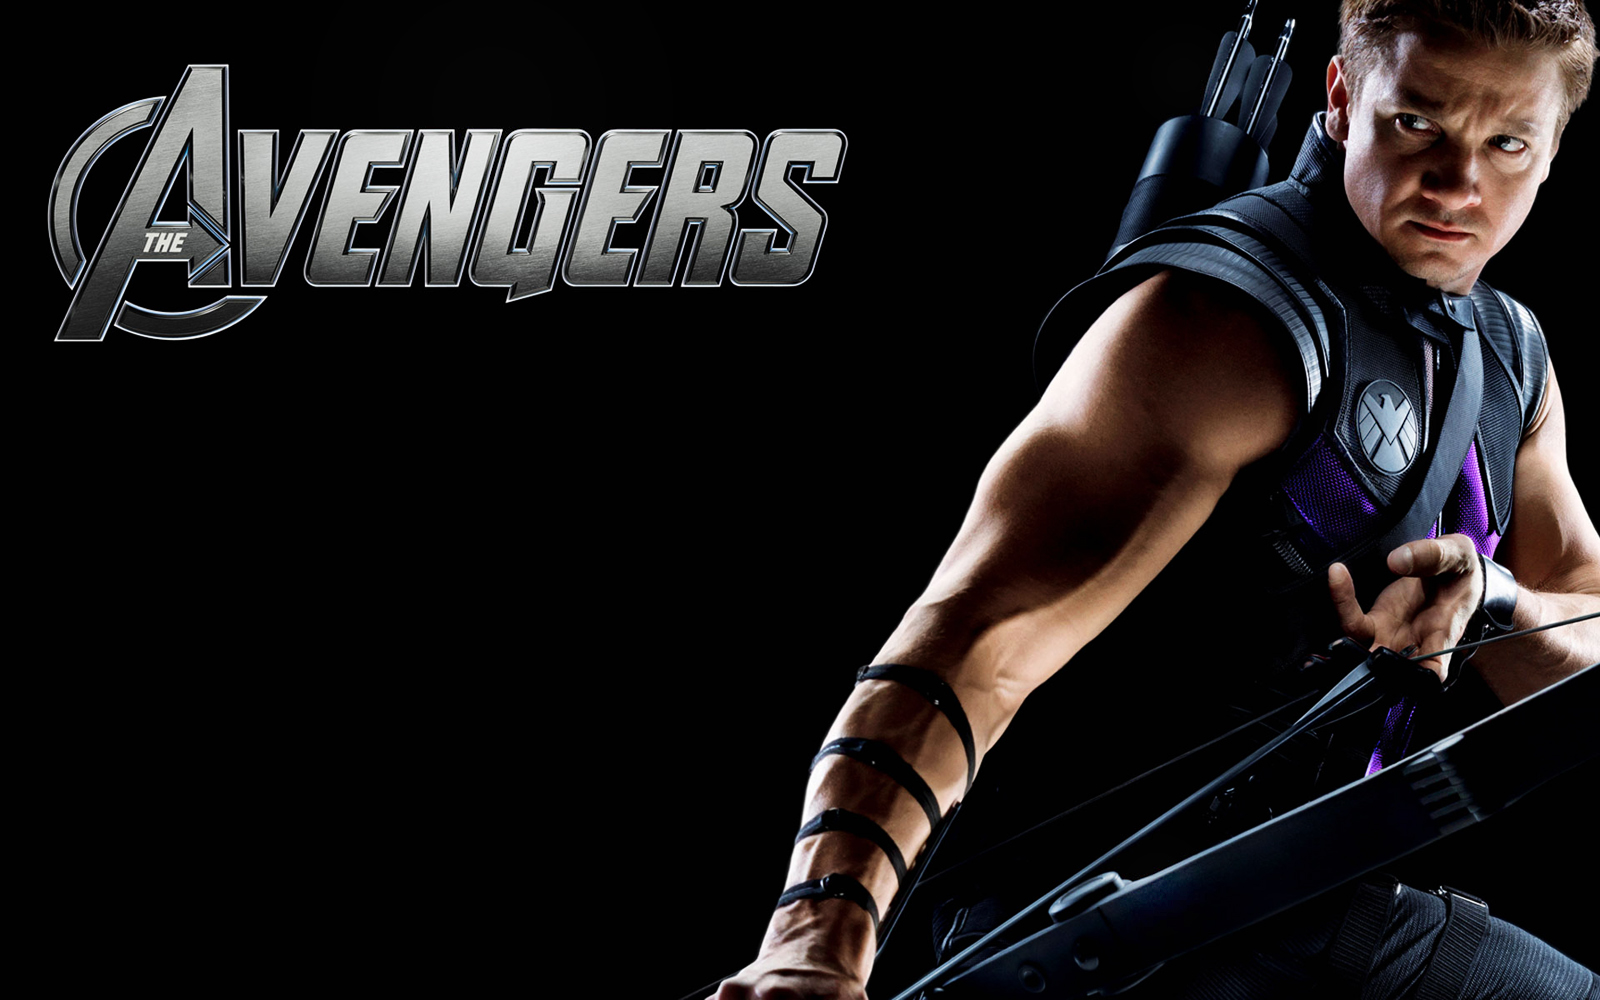 http://1.bp.blogspot.com/-_UUyIEK6EfE/UIZSv5QnYPI/AAAAAAAAFmw/nx6ys8pYSpU/s1600/Hawkeye-The-Avengers-HD-Wallpaper_Vvallpaper.Net.jpg